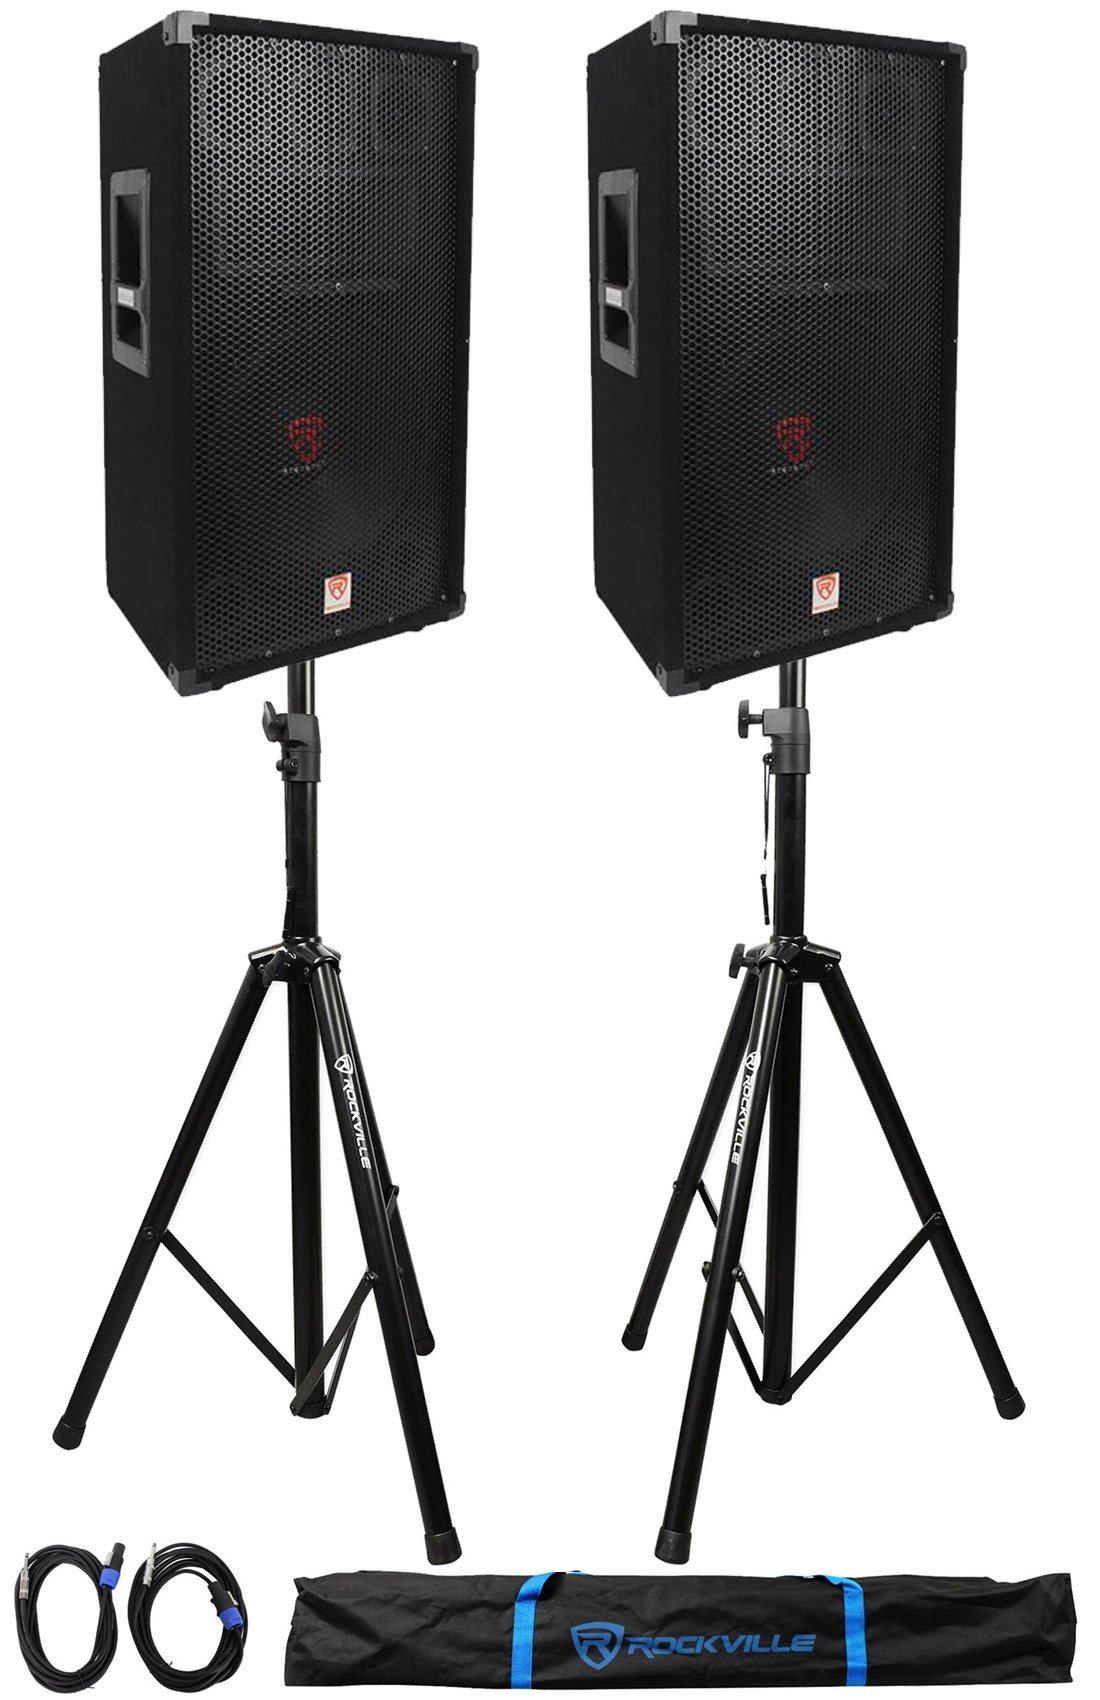 "(2)Rockville RSG12 12"" 3Way 1000 Watt 8Ohm Passive DJ PA Speaker +Stands +Cables"